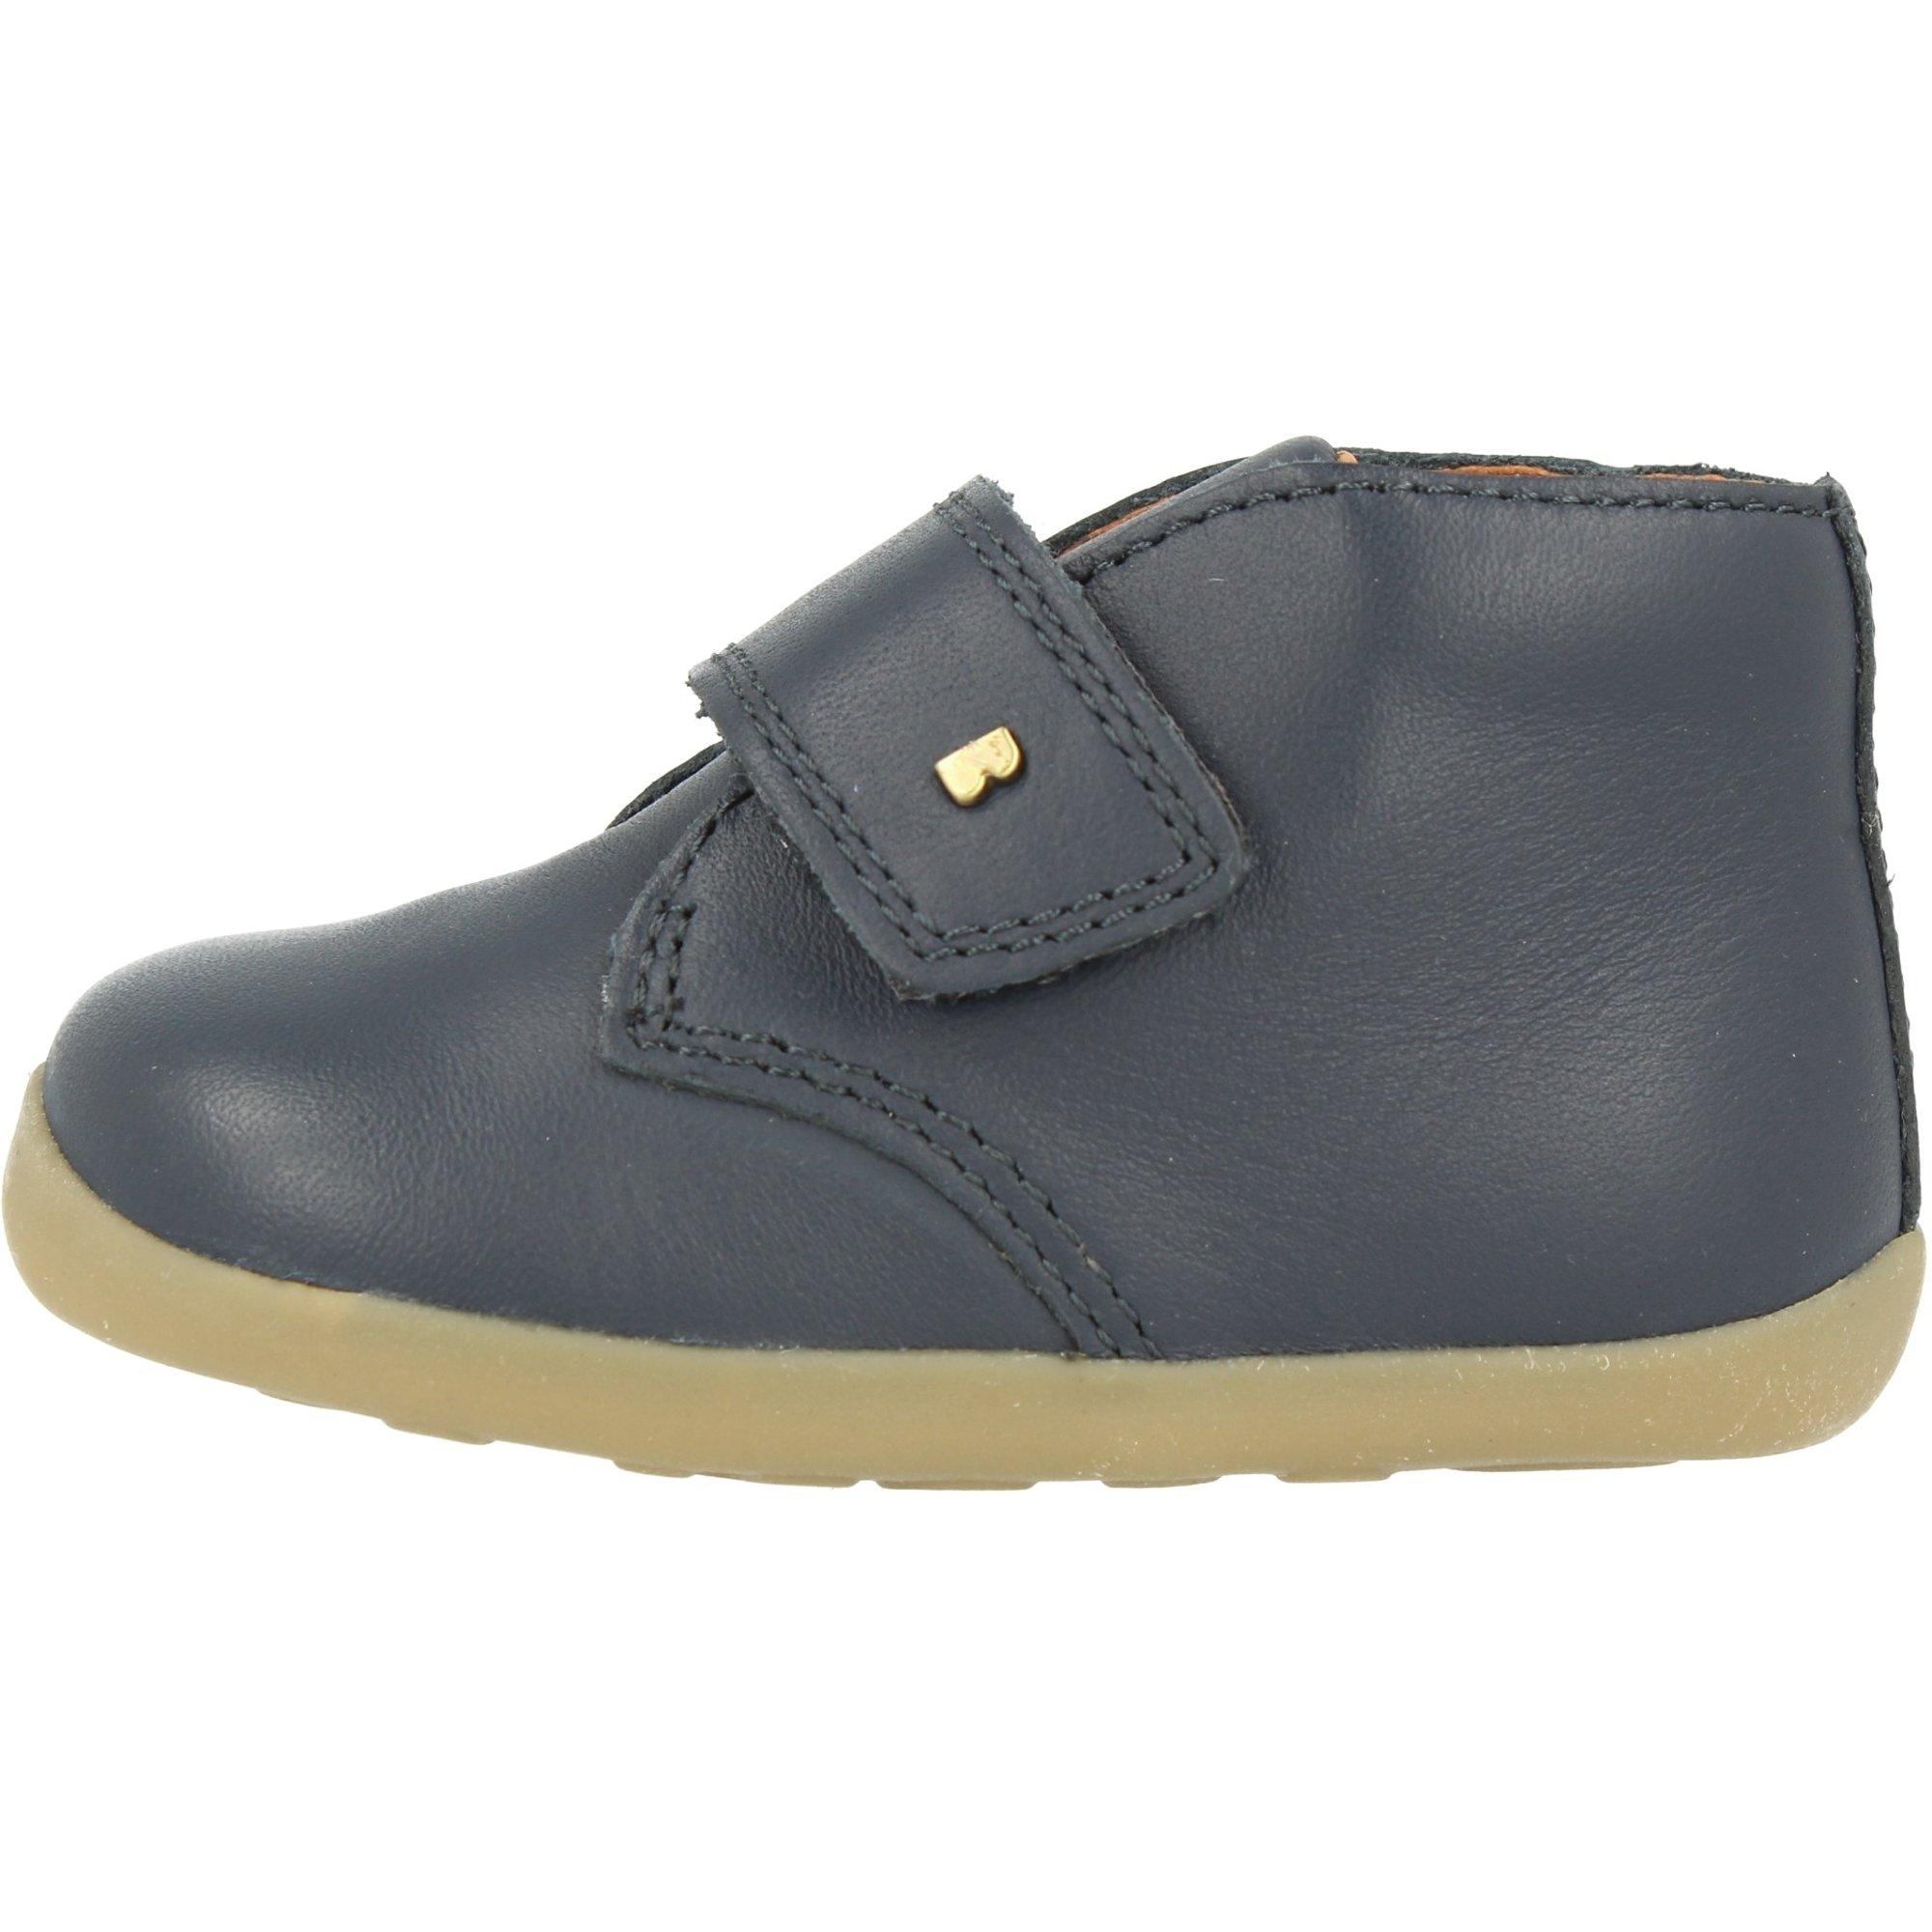 Bobux Step Up Desert Navy Leather